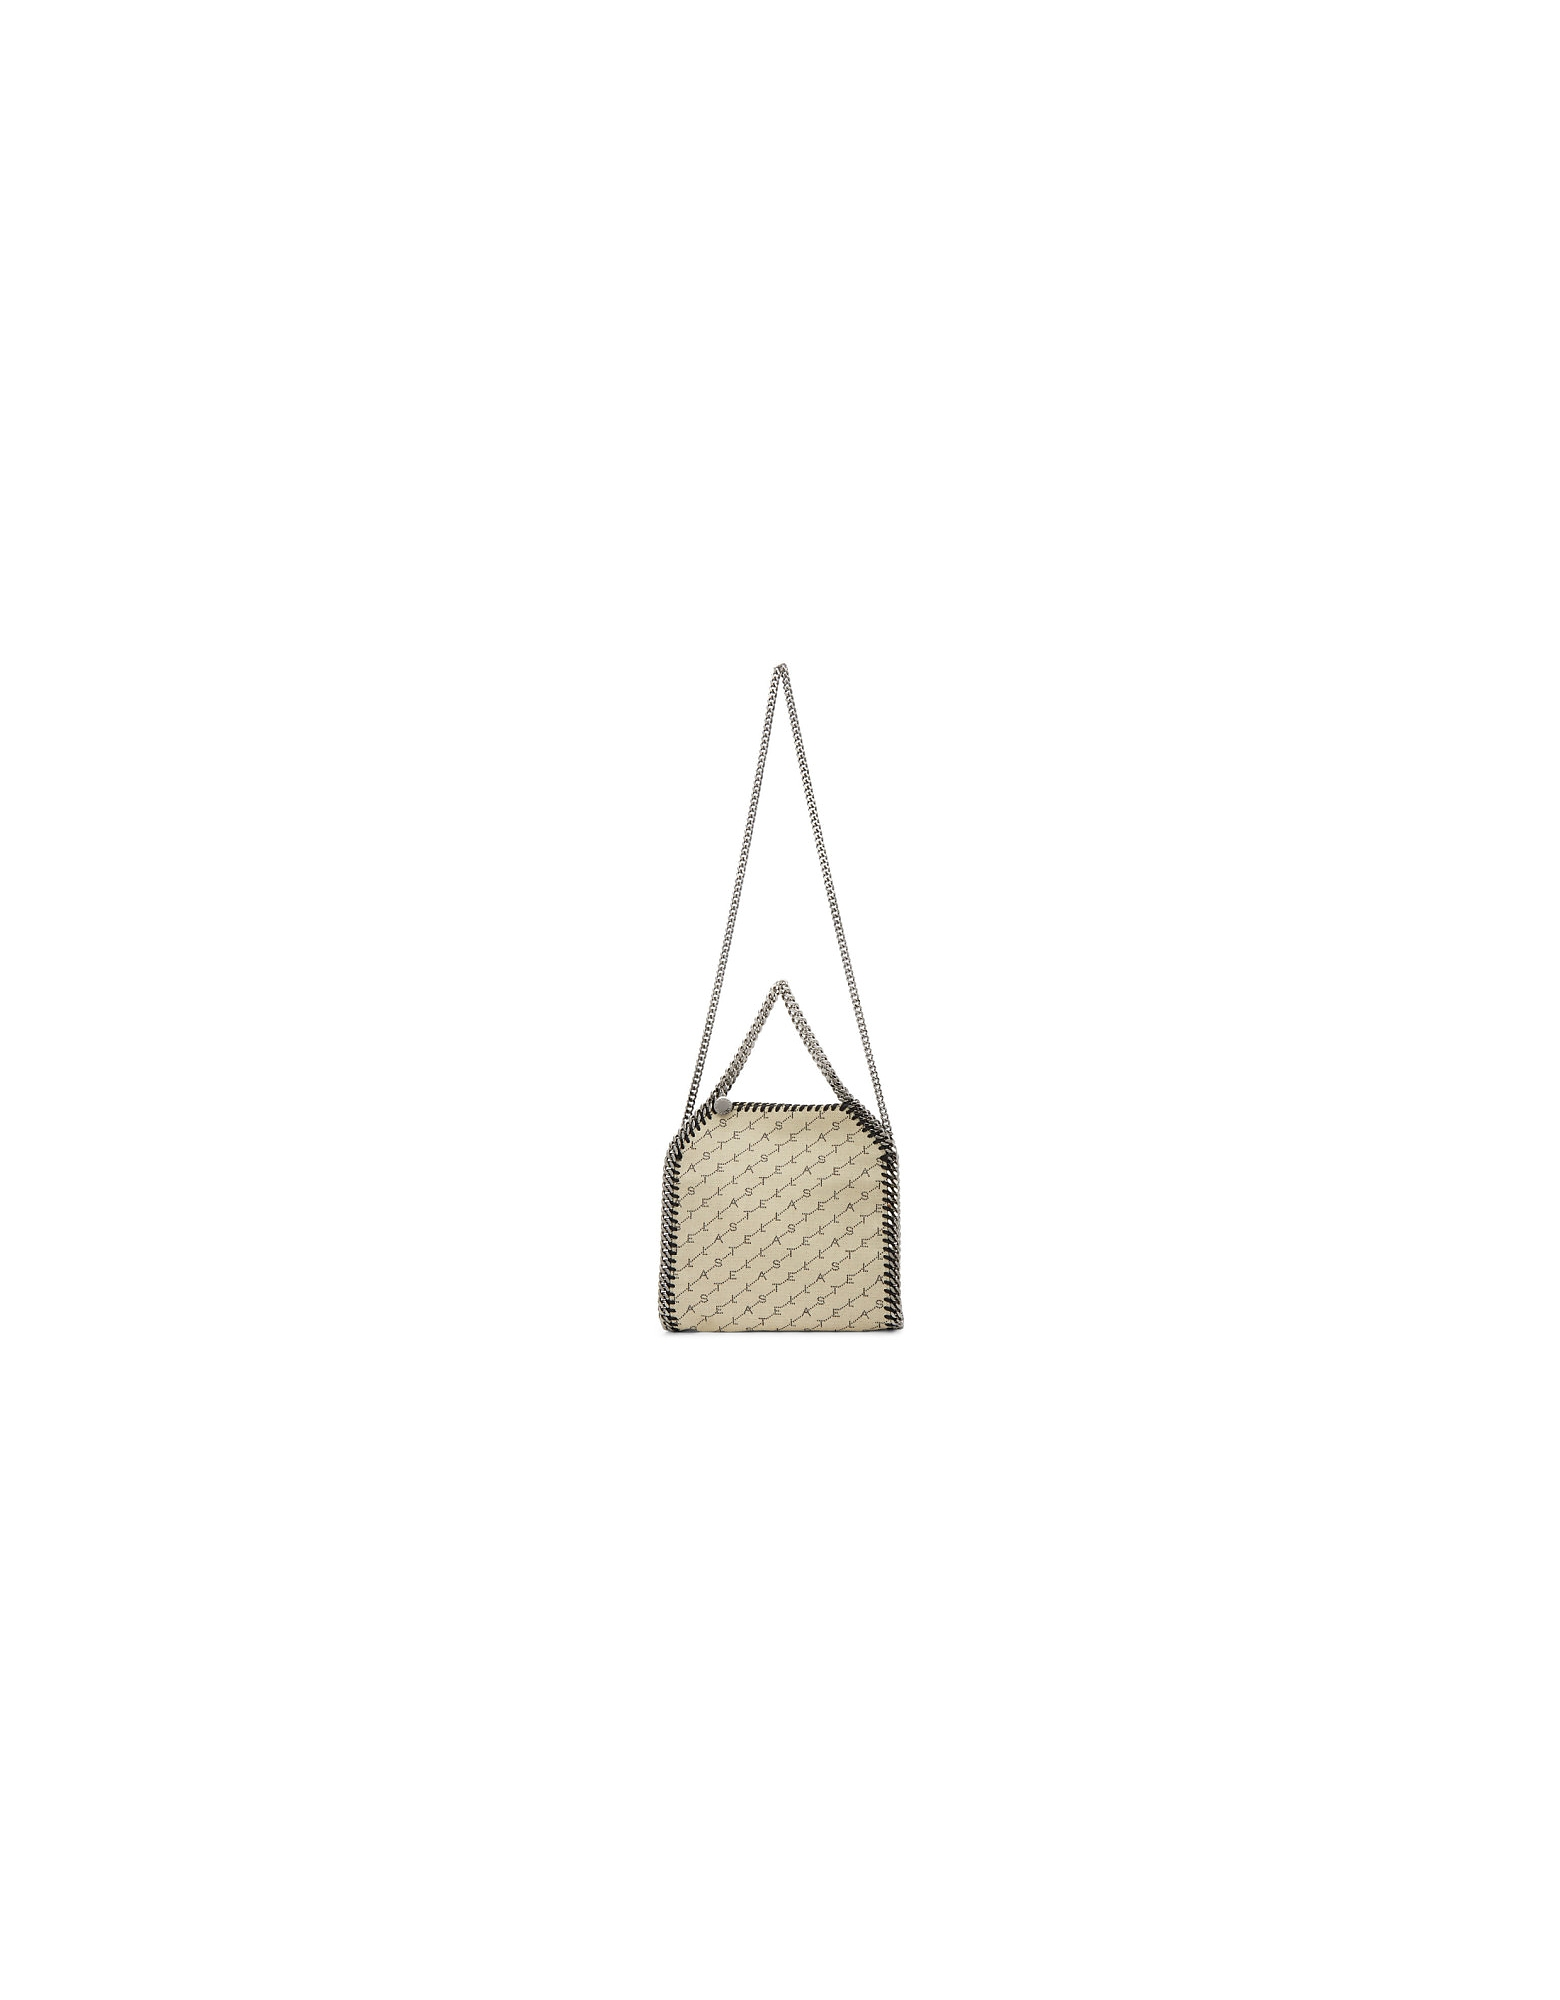 Stella McCartney Designer Handbags, Beige Mini Falabella Monogram Tote